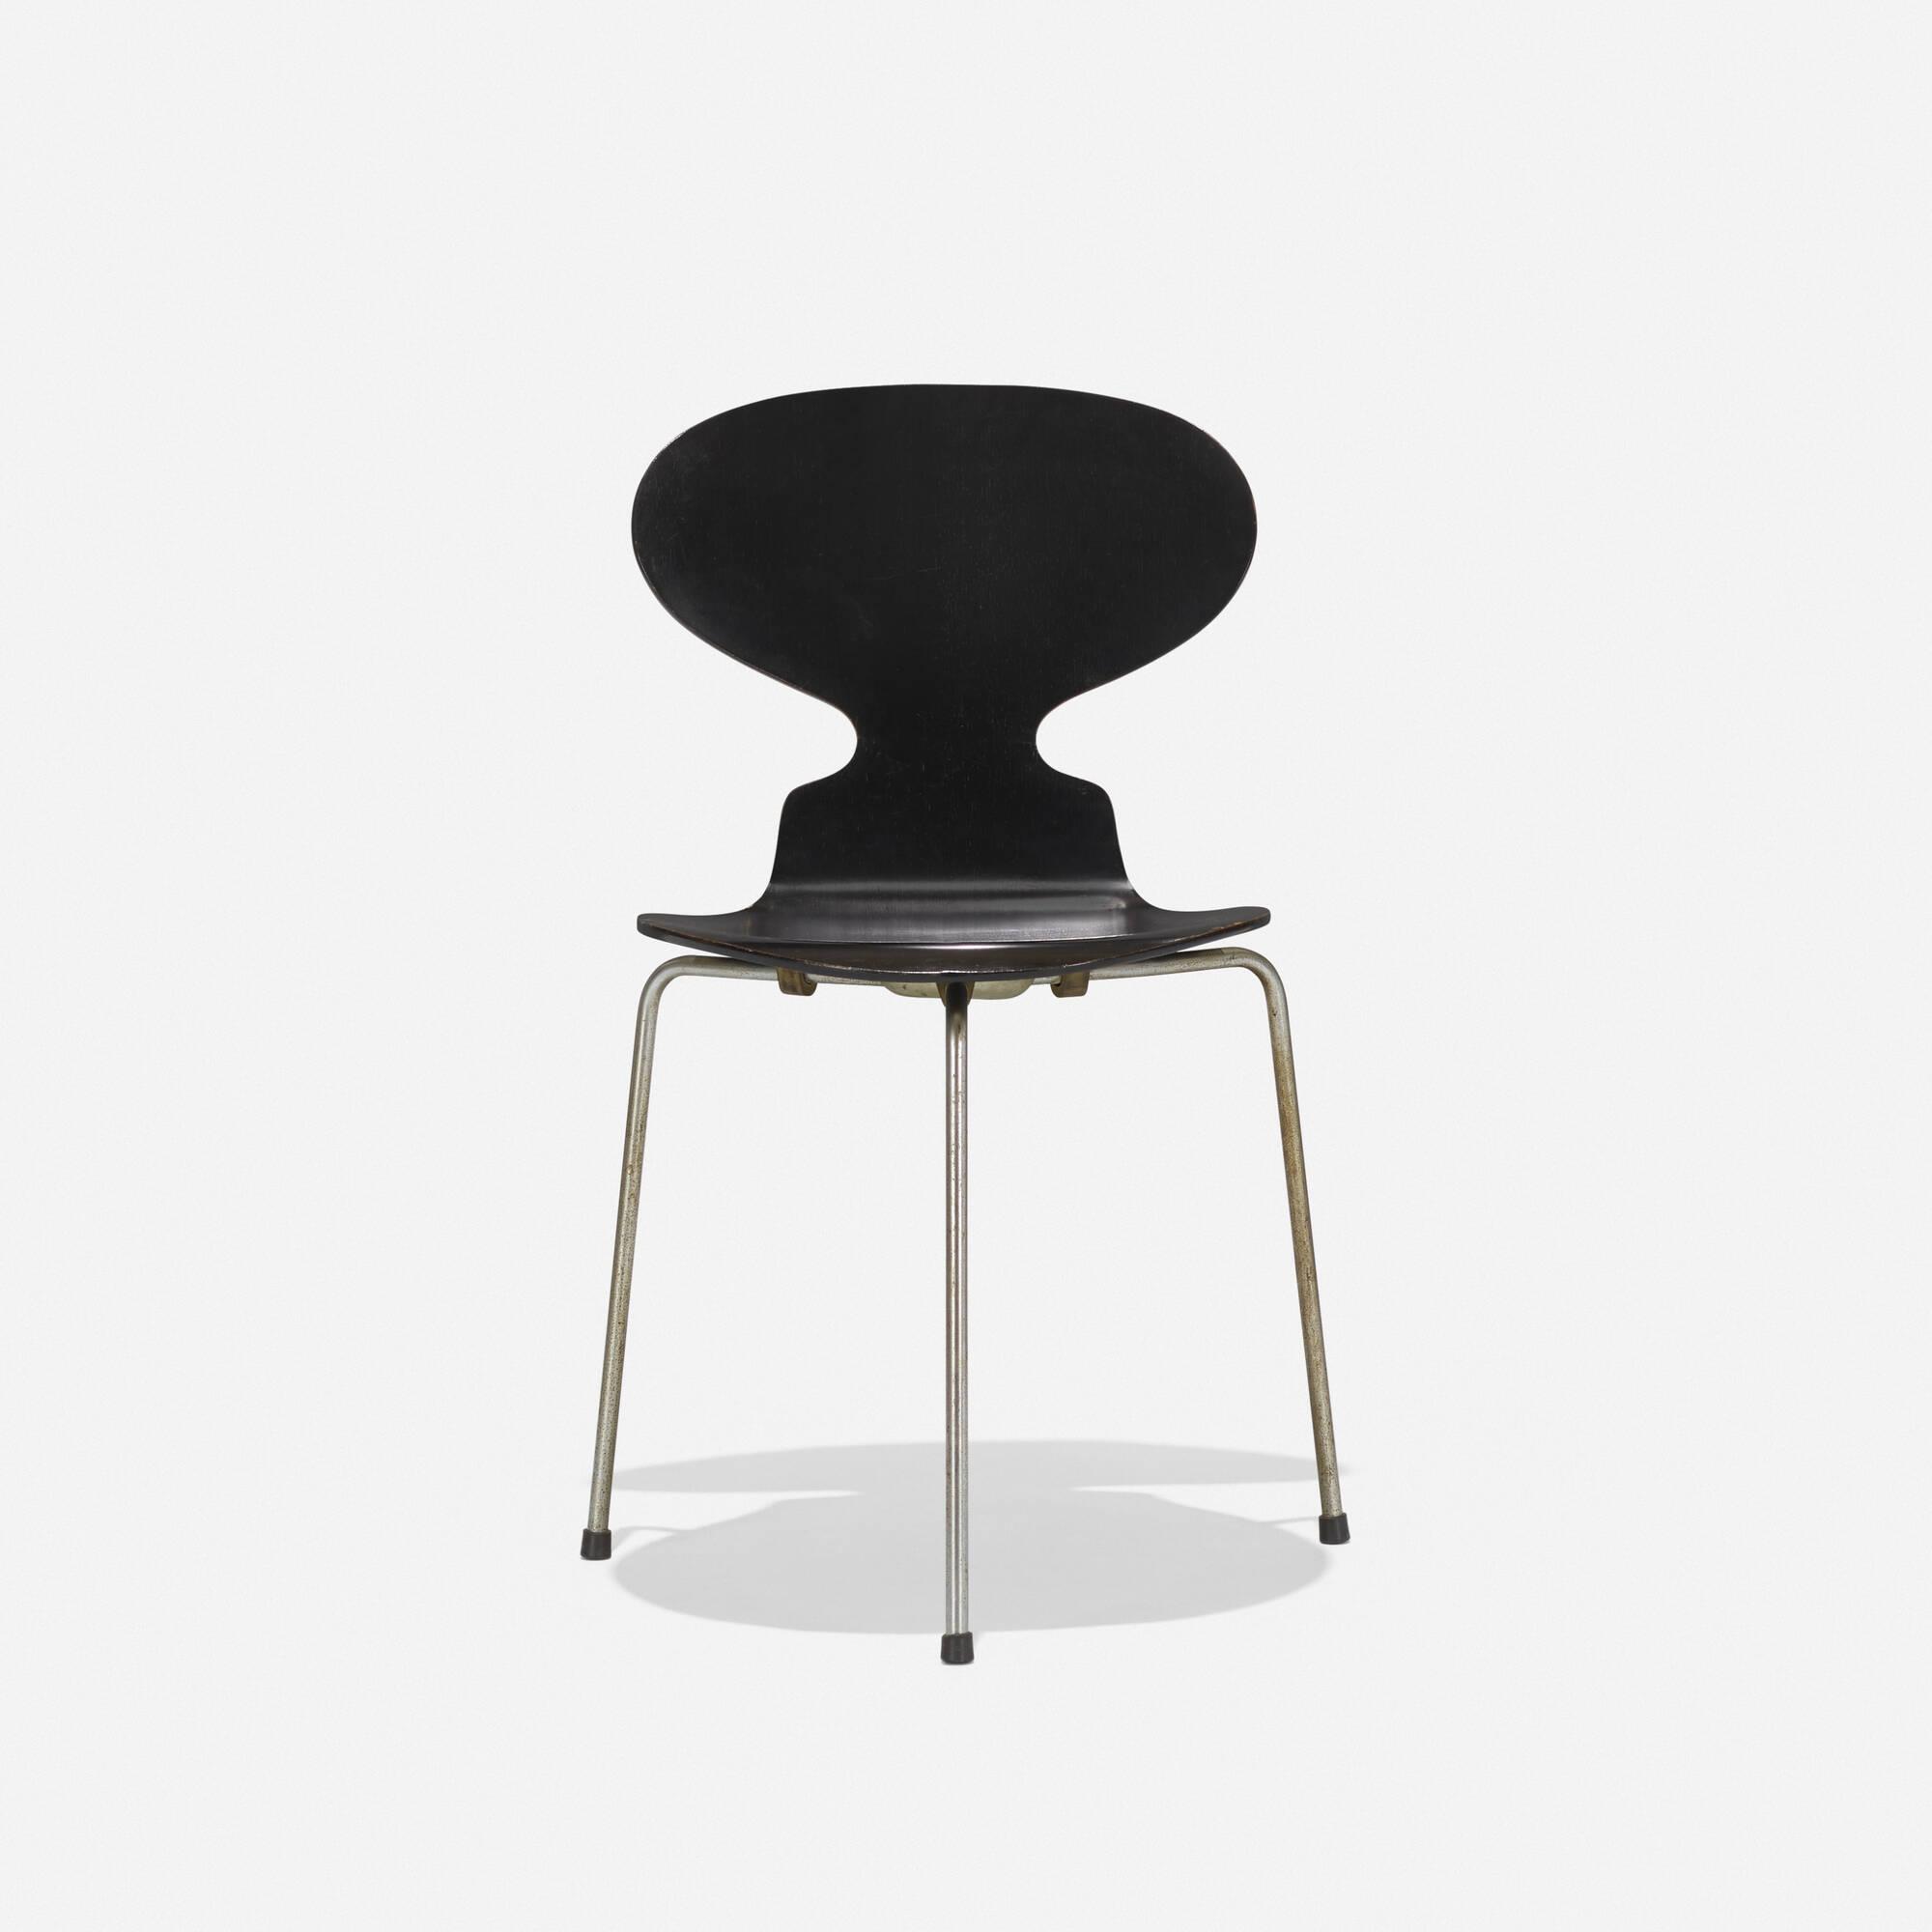 413: Arne Jacobsen / Ant chair (1 of 3)